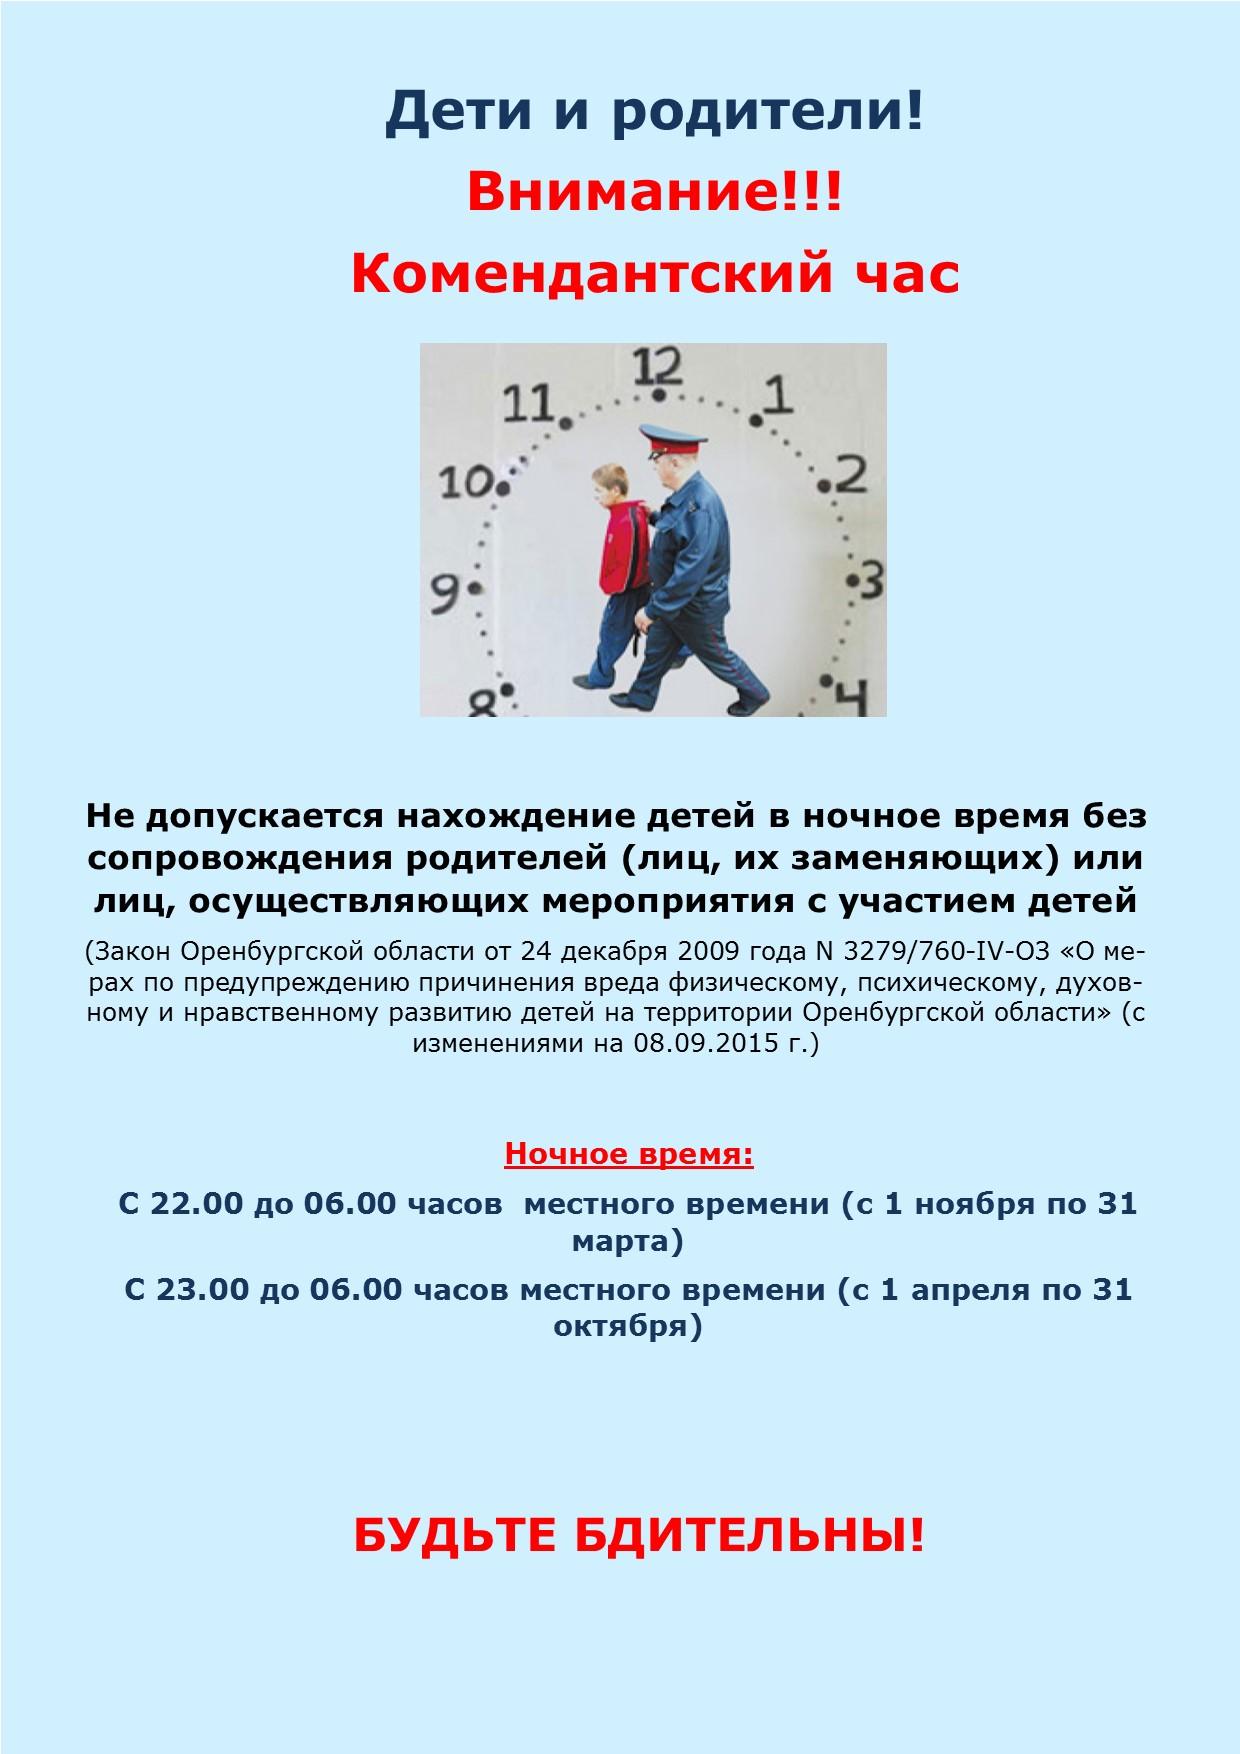 санкт петербург комендантский час